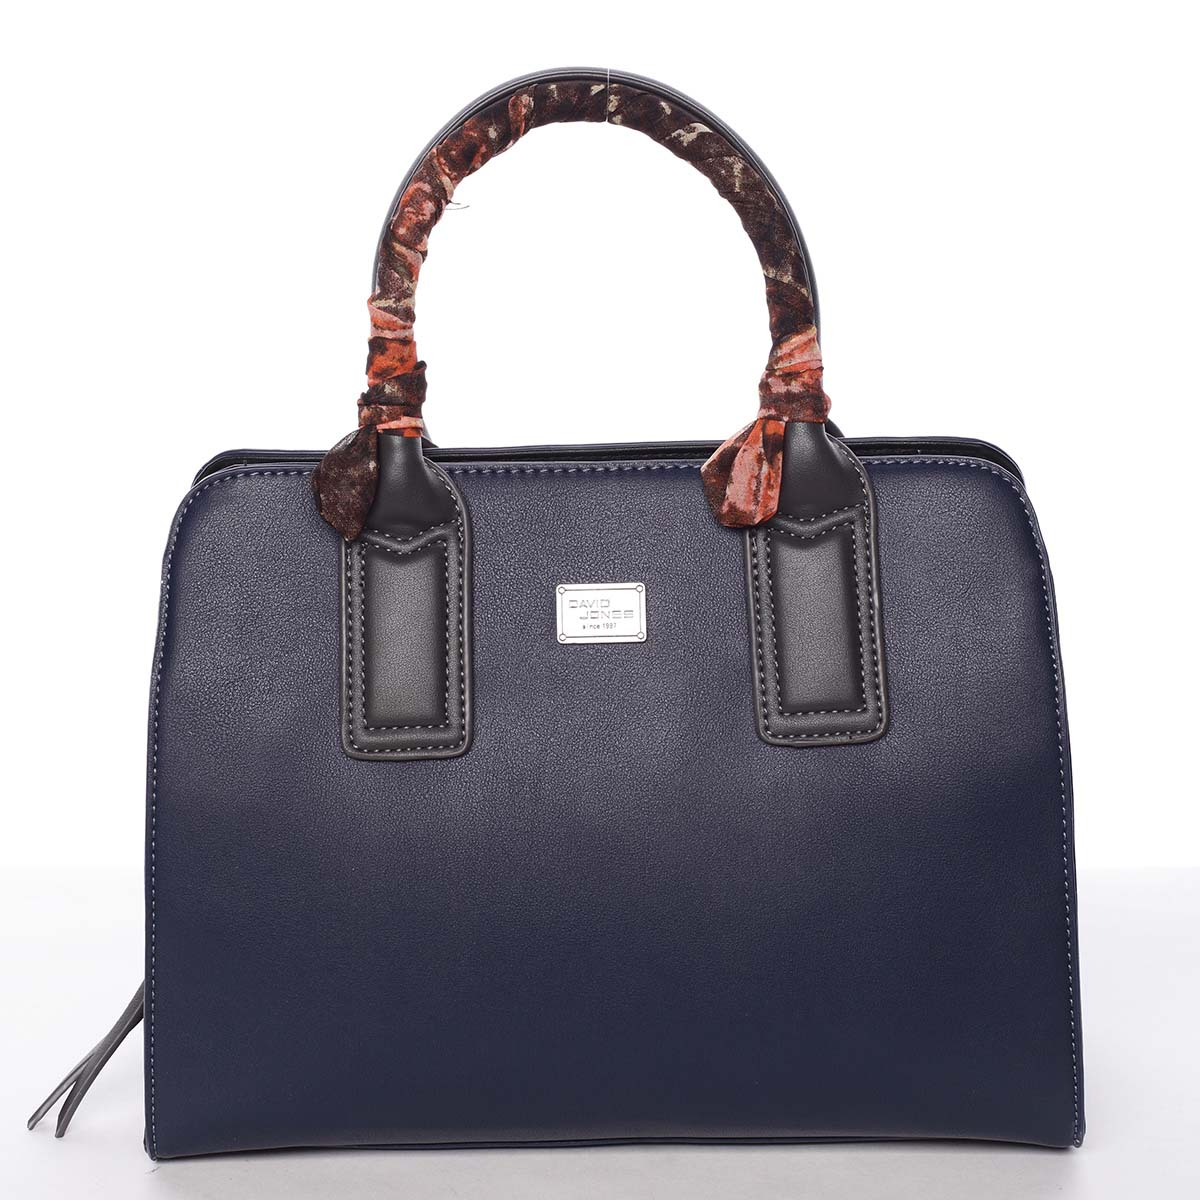 Štýlová trendy dámska kabelka do ruky tmavomodrá - David Jones Crescent modrá